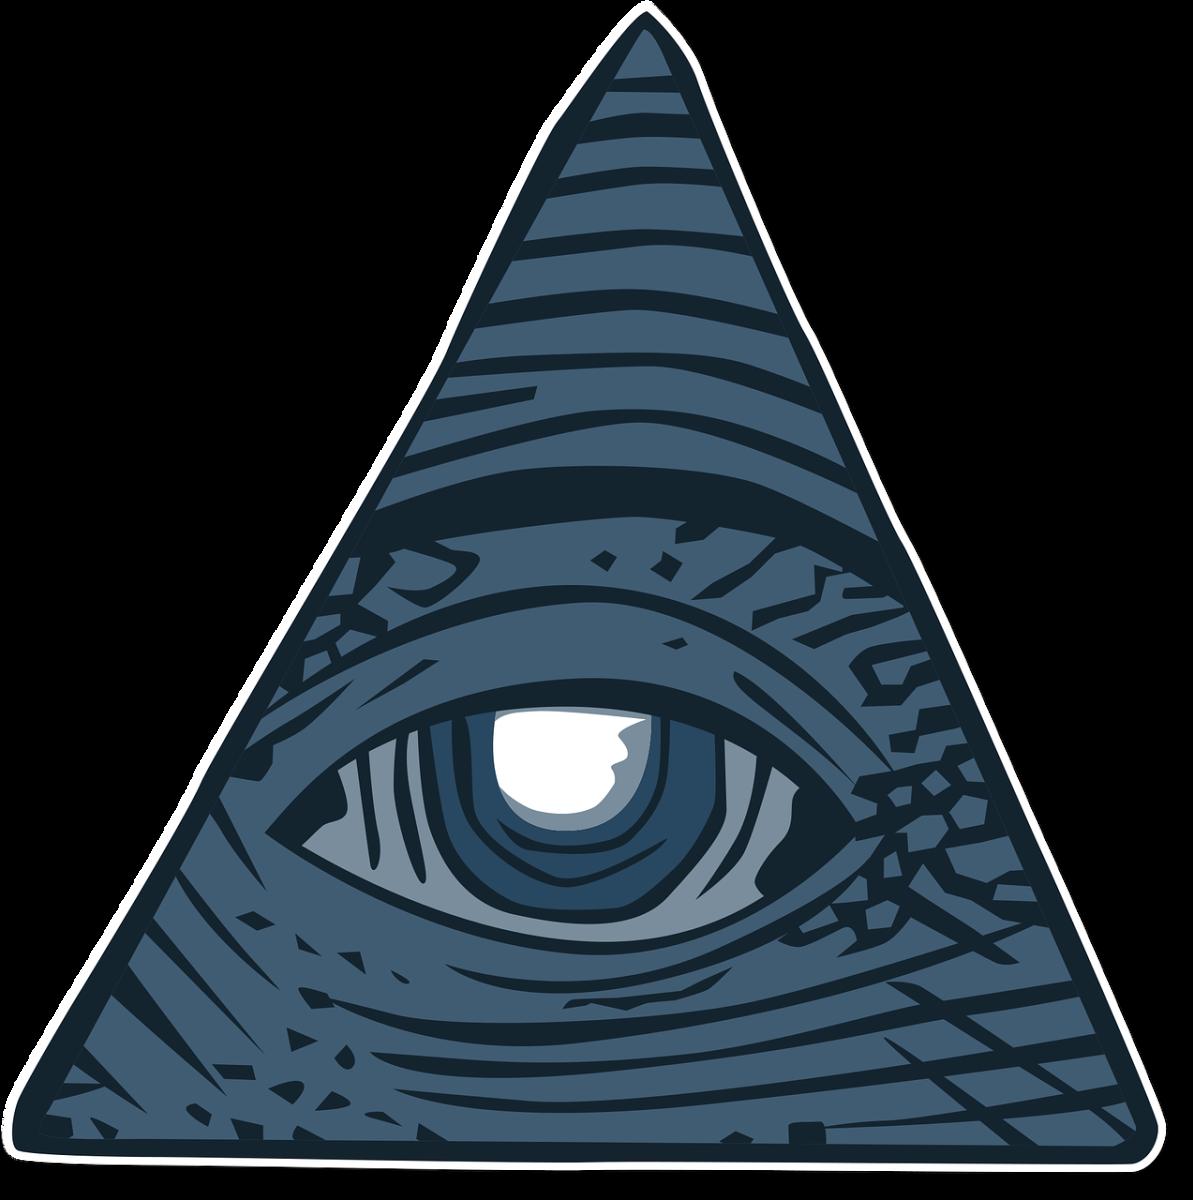 The Real Truth About Illuminati-Part 1